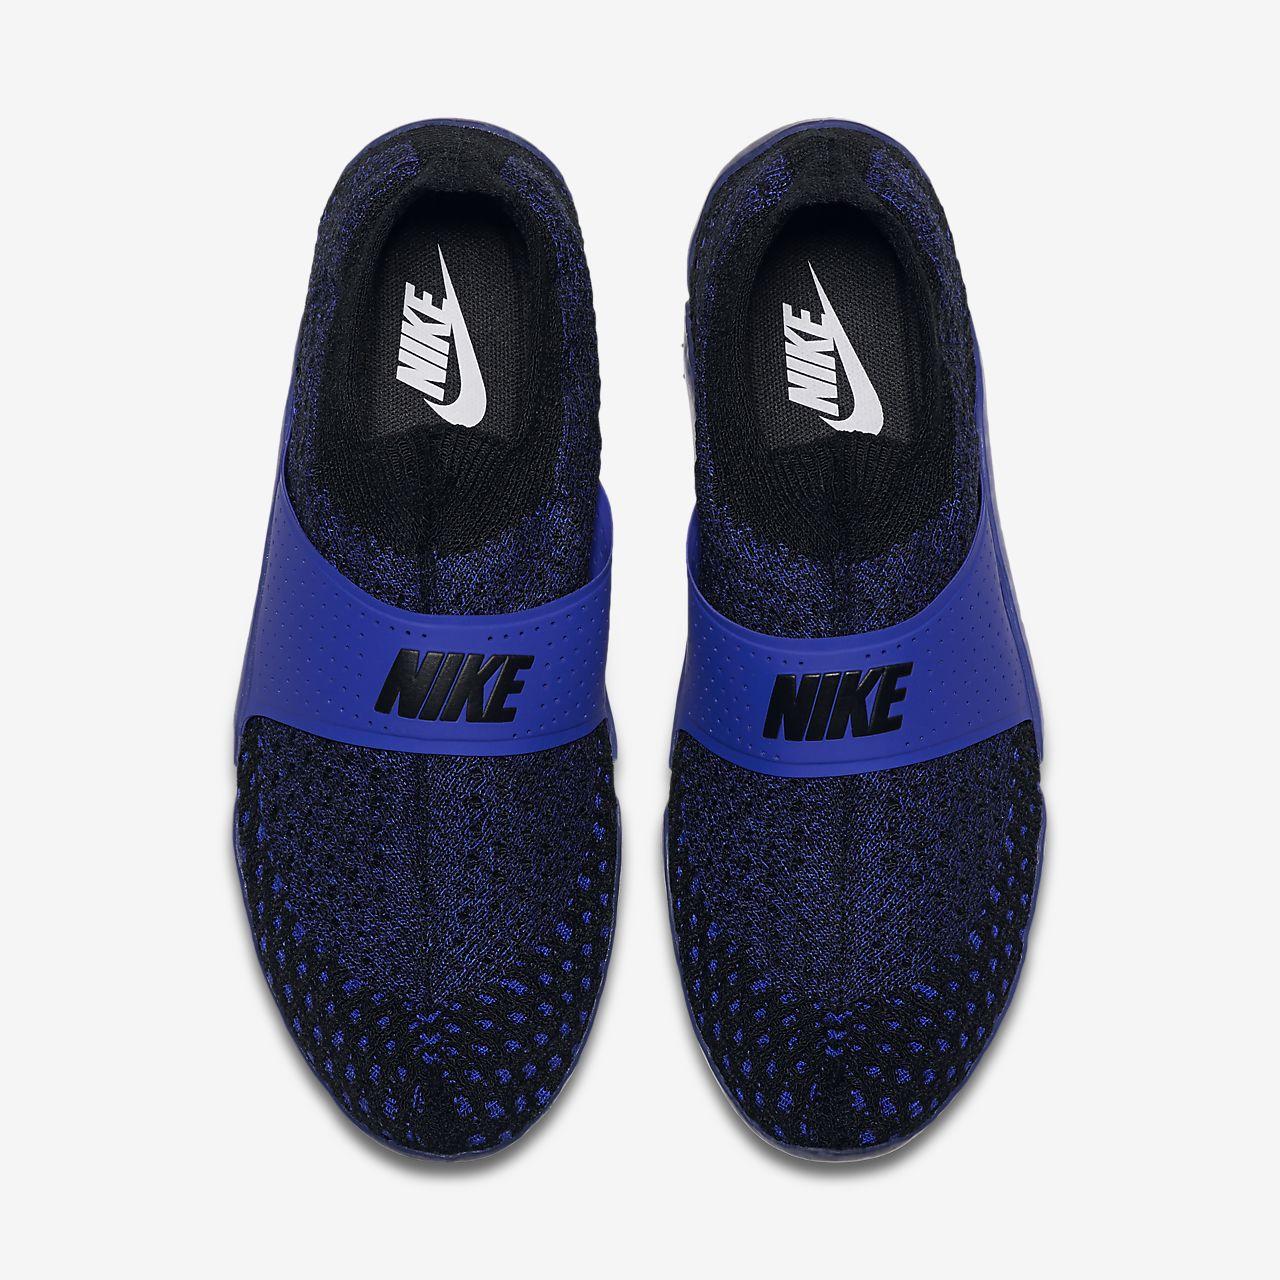 innovative design 74b5b 70a7a ... NikeLab City Knife 3 Flyknit Womens Shoe